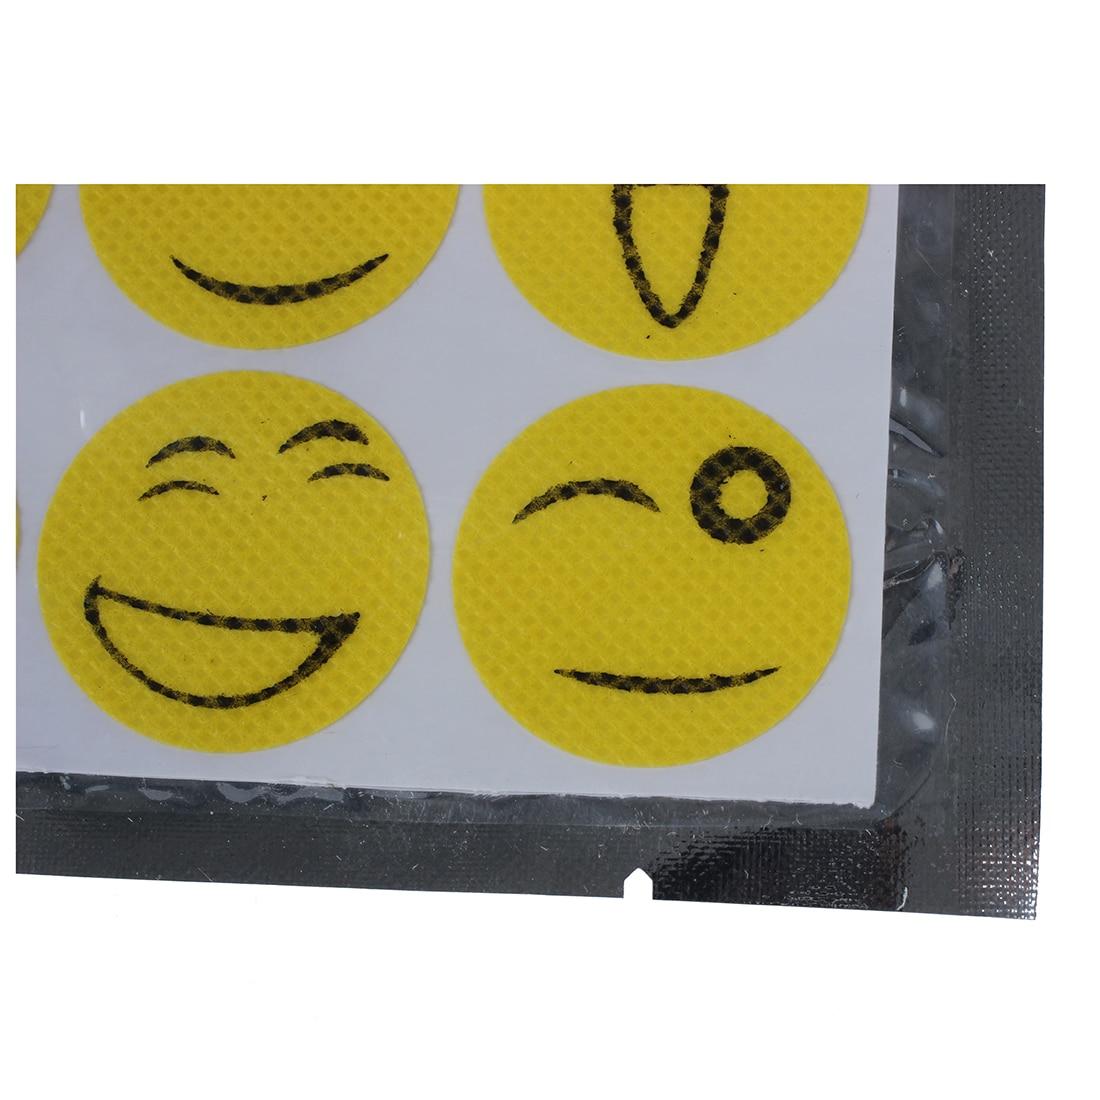 6 Pcs/Bags Baby Anti Mosquito Drive Midge Stickers Repellent Patch 5.5 * 4 * 8CM random color